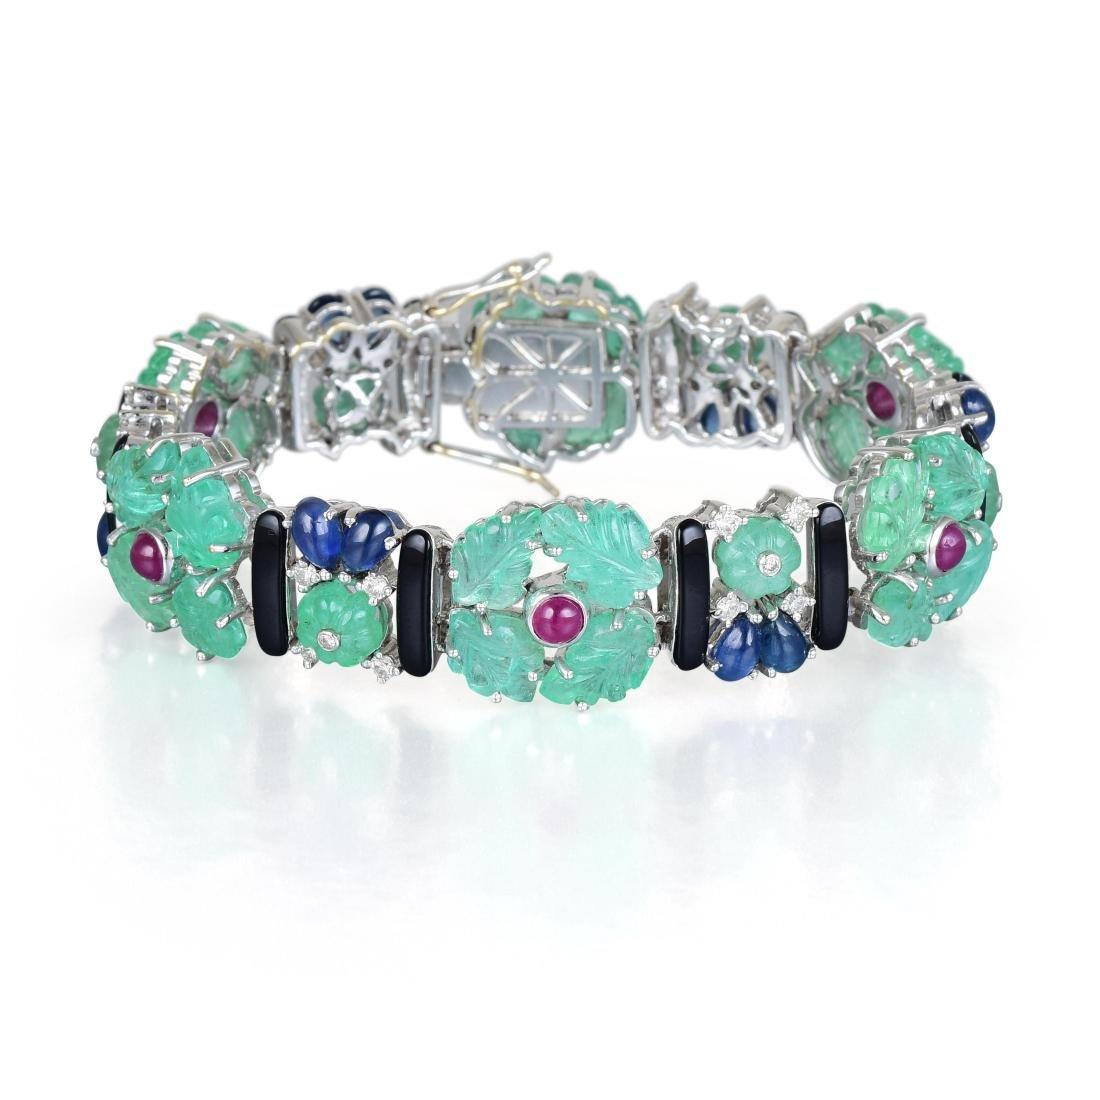 A Tutti-Frutti Multi-Gem and Diamond Bracelet